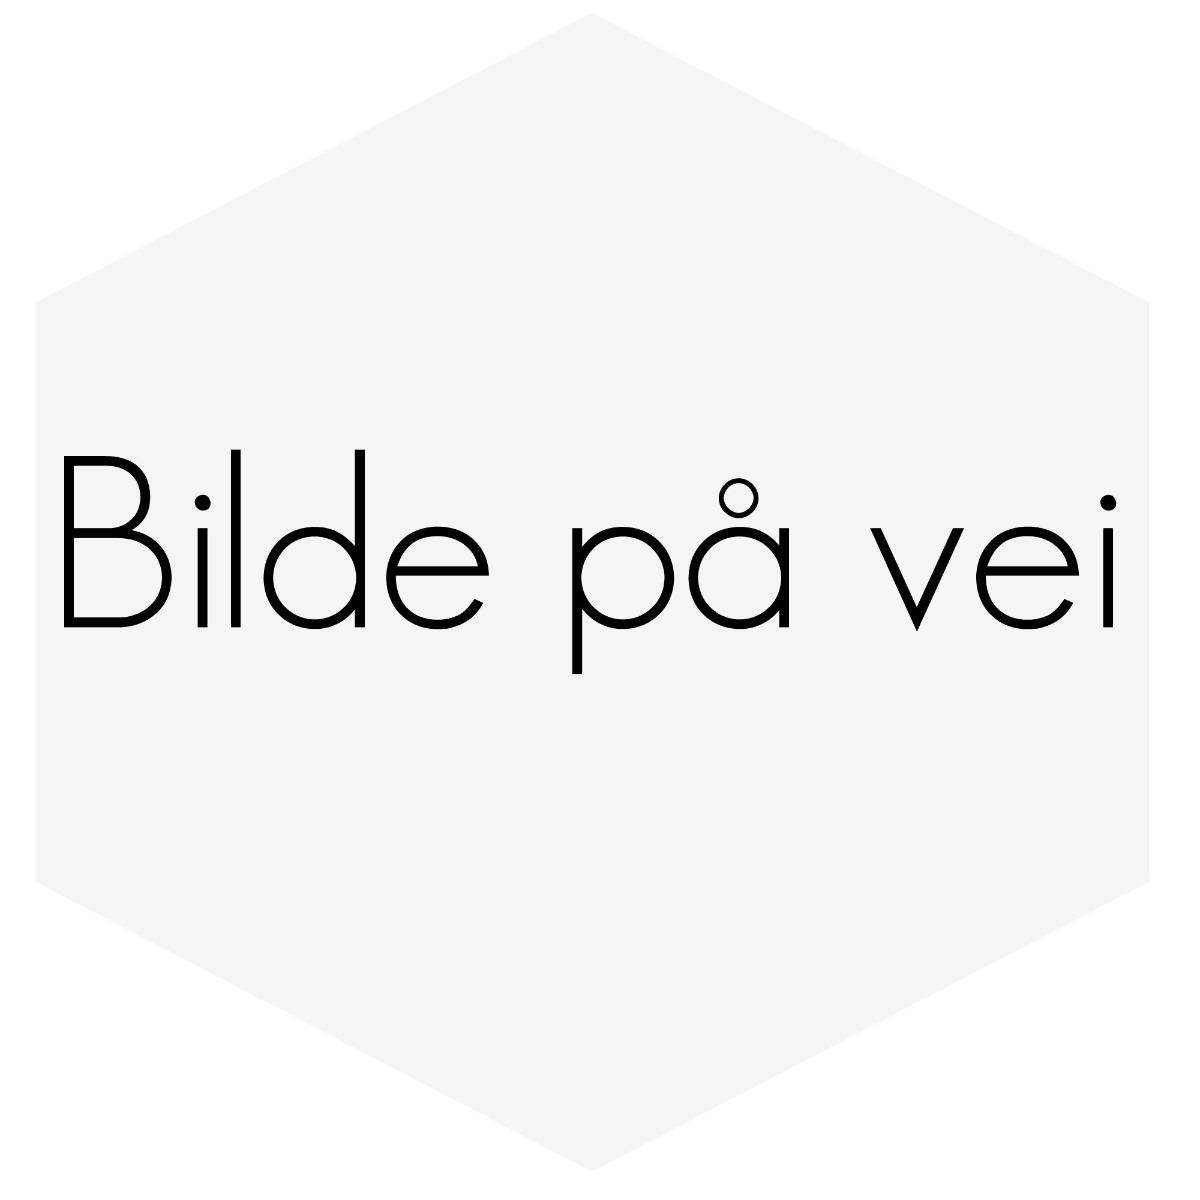 STØTDEMPER BAK GUL JUSTERBAR KONI S40/V40-1996--5/99